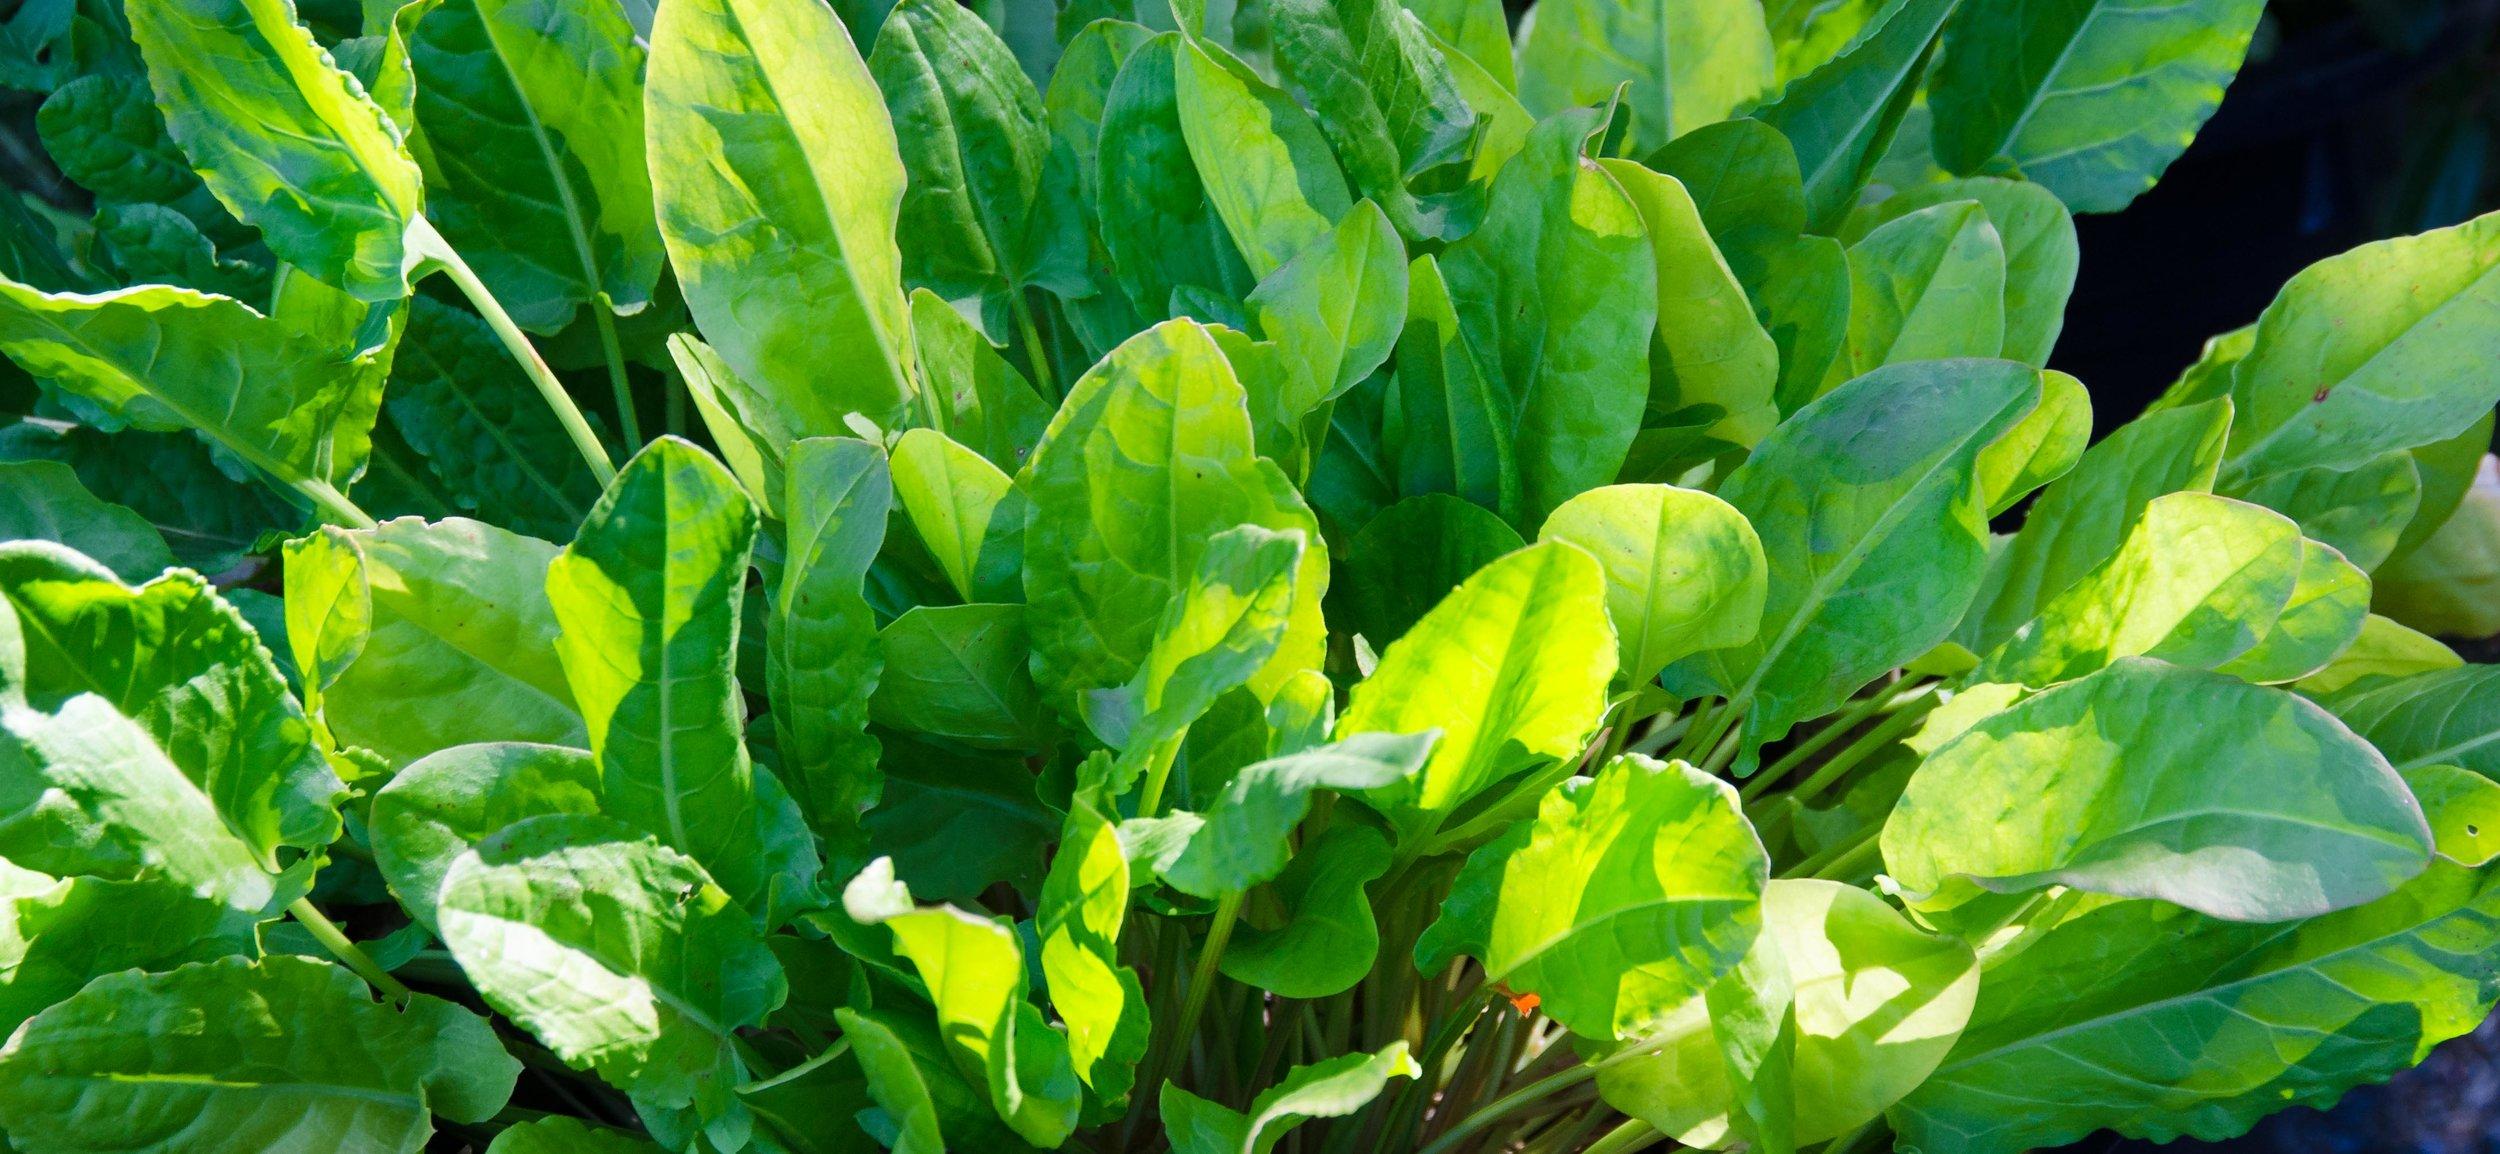 Organic-French-Sorrel-at-Blue-Egg-Farm-in-Orinda-5617.jpg